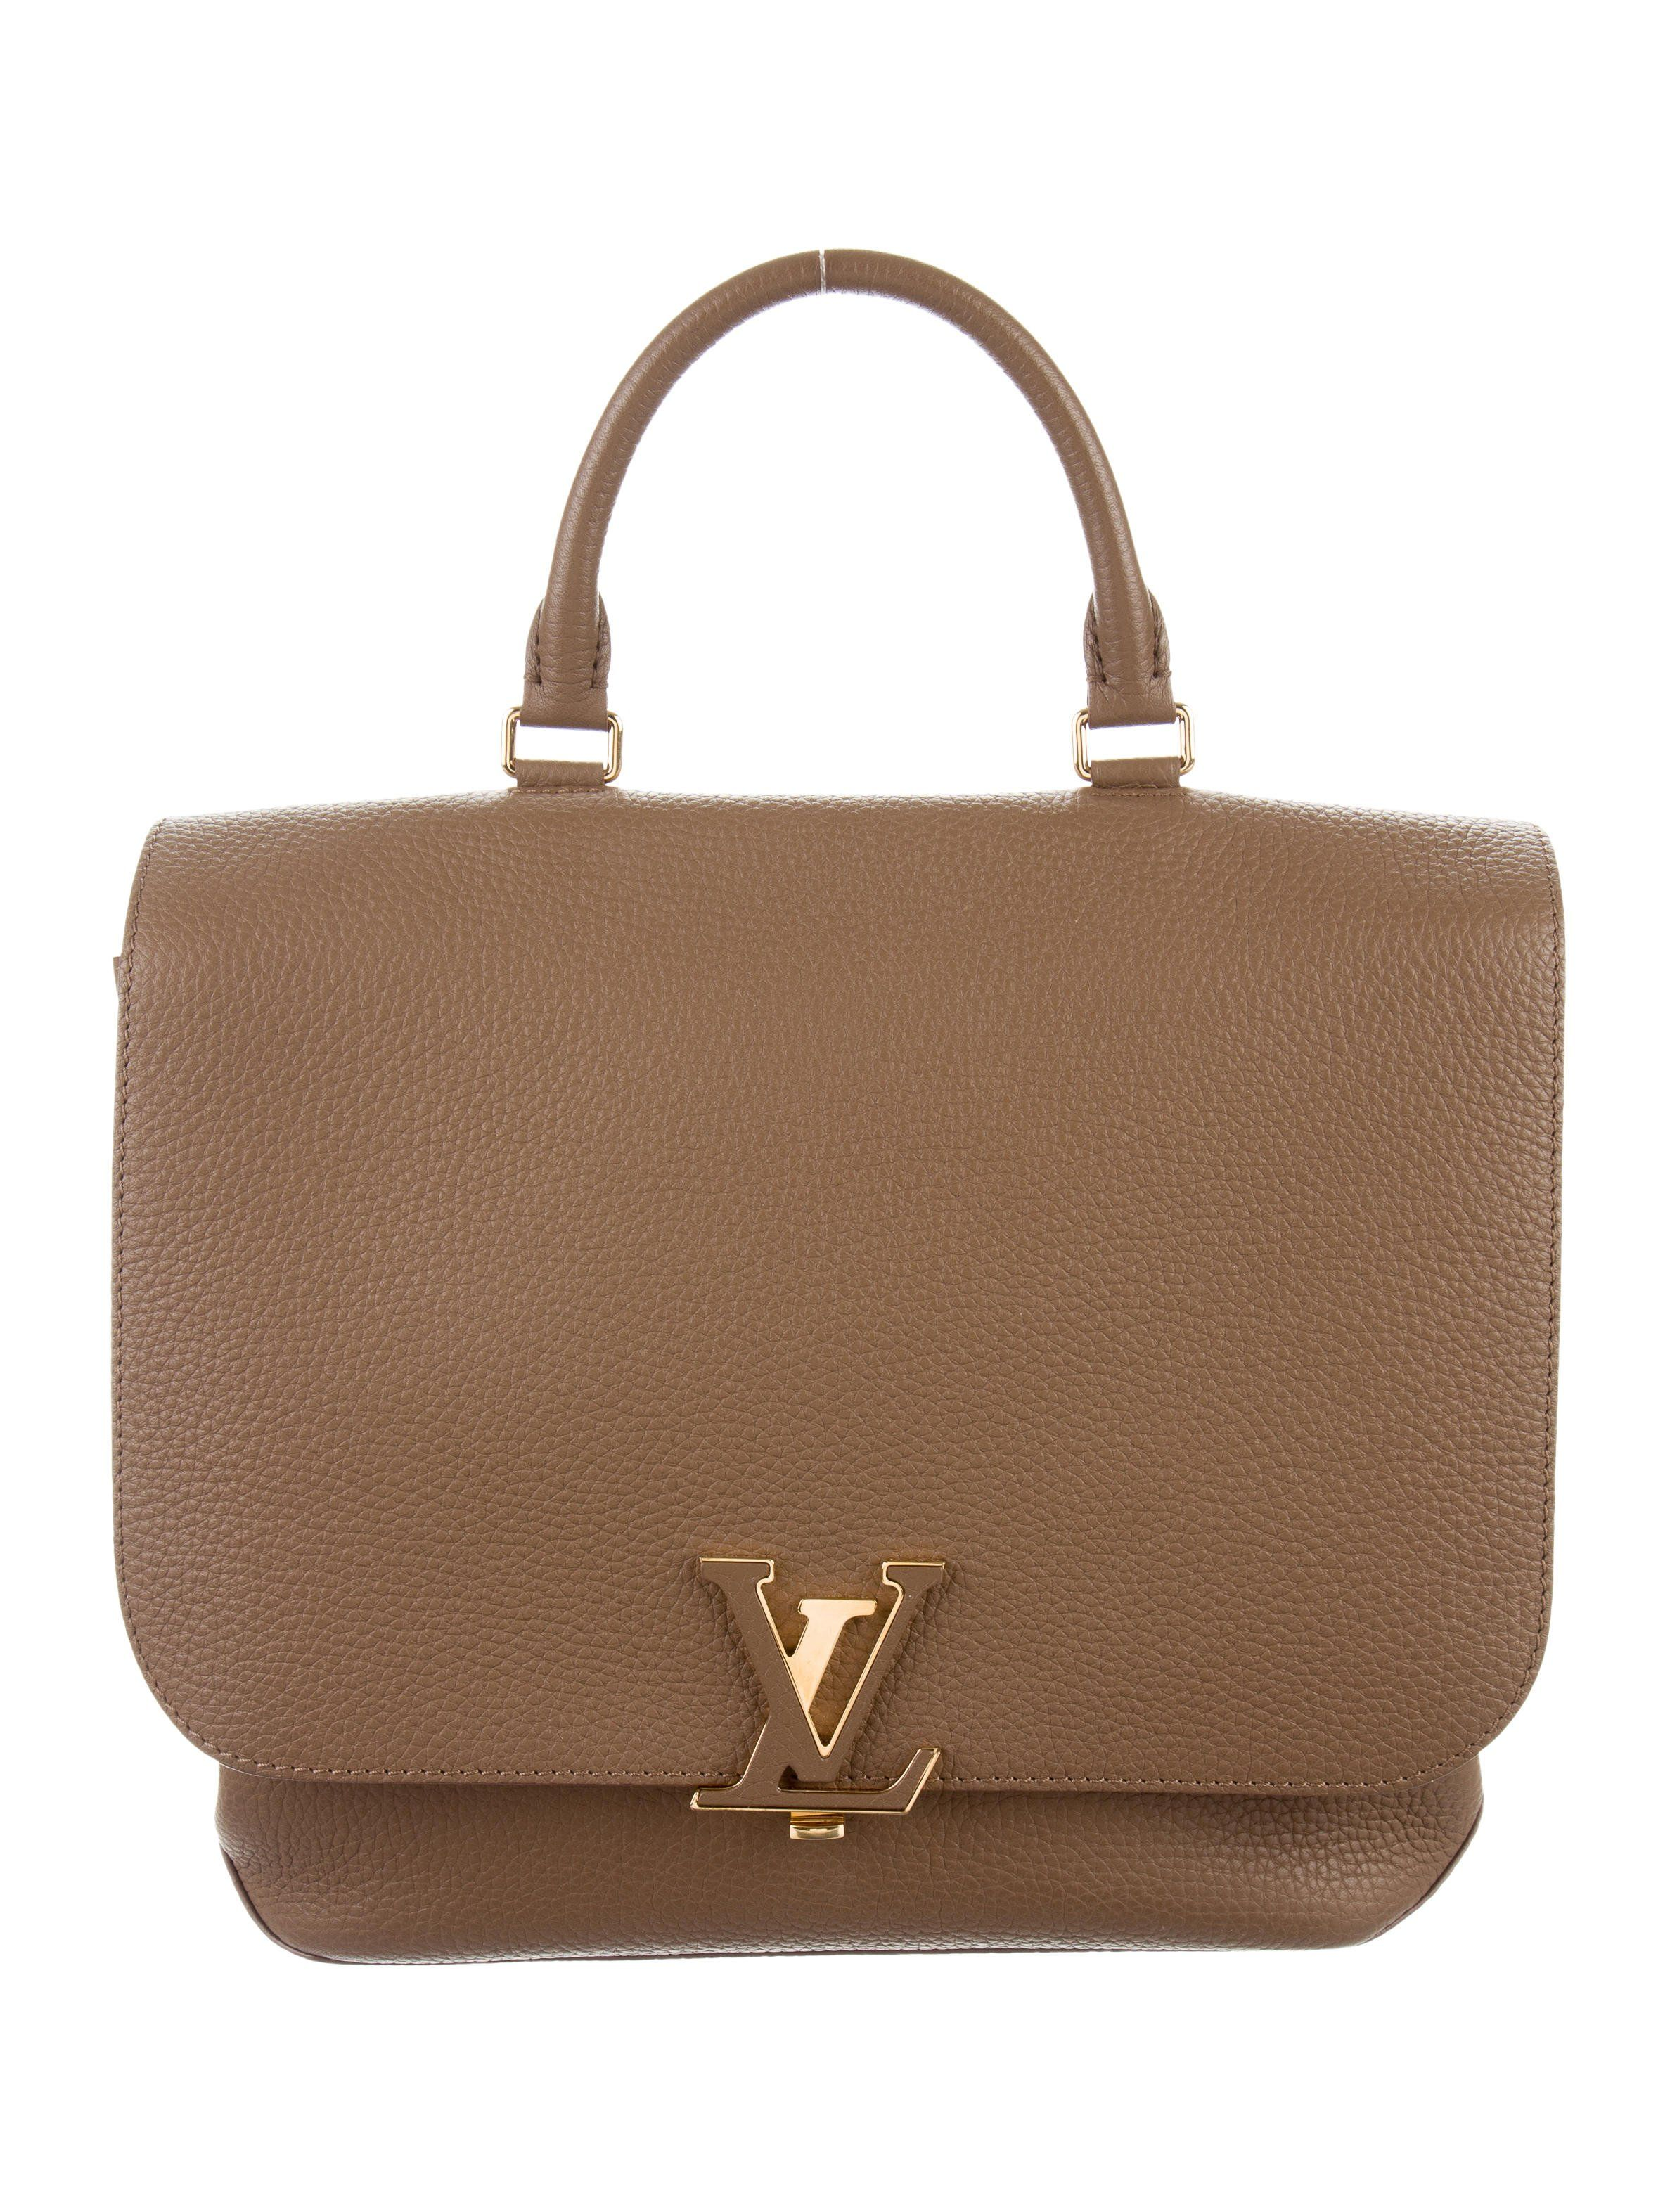 c3c0dd41 2015 Taurillon Volta Bag in 2019 | Louis Vuitton | Bags, Louis ...